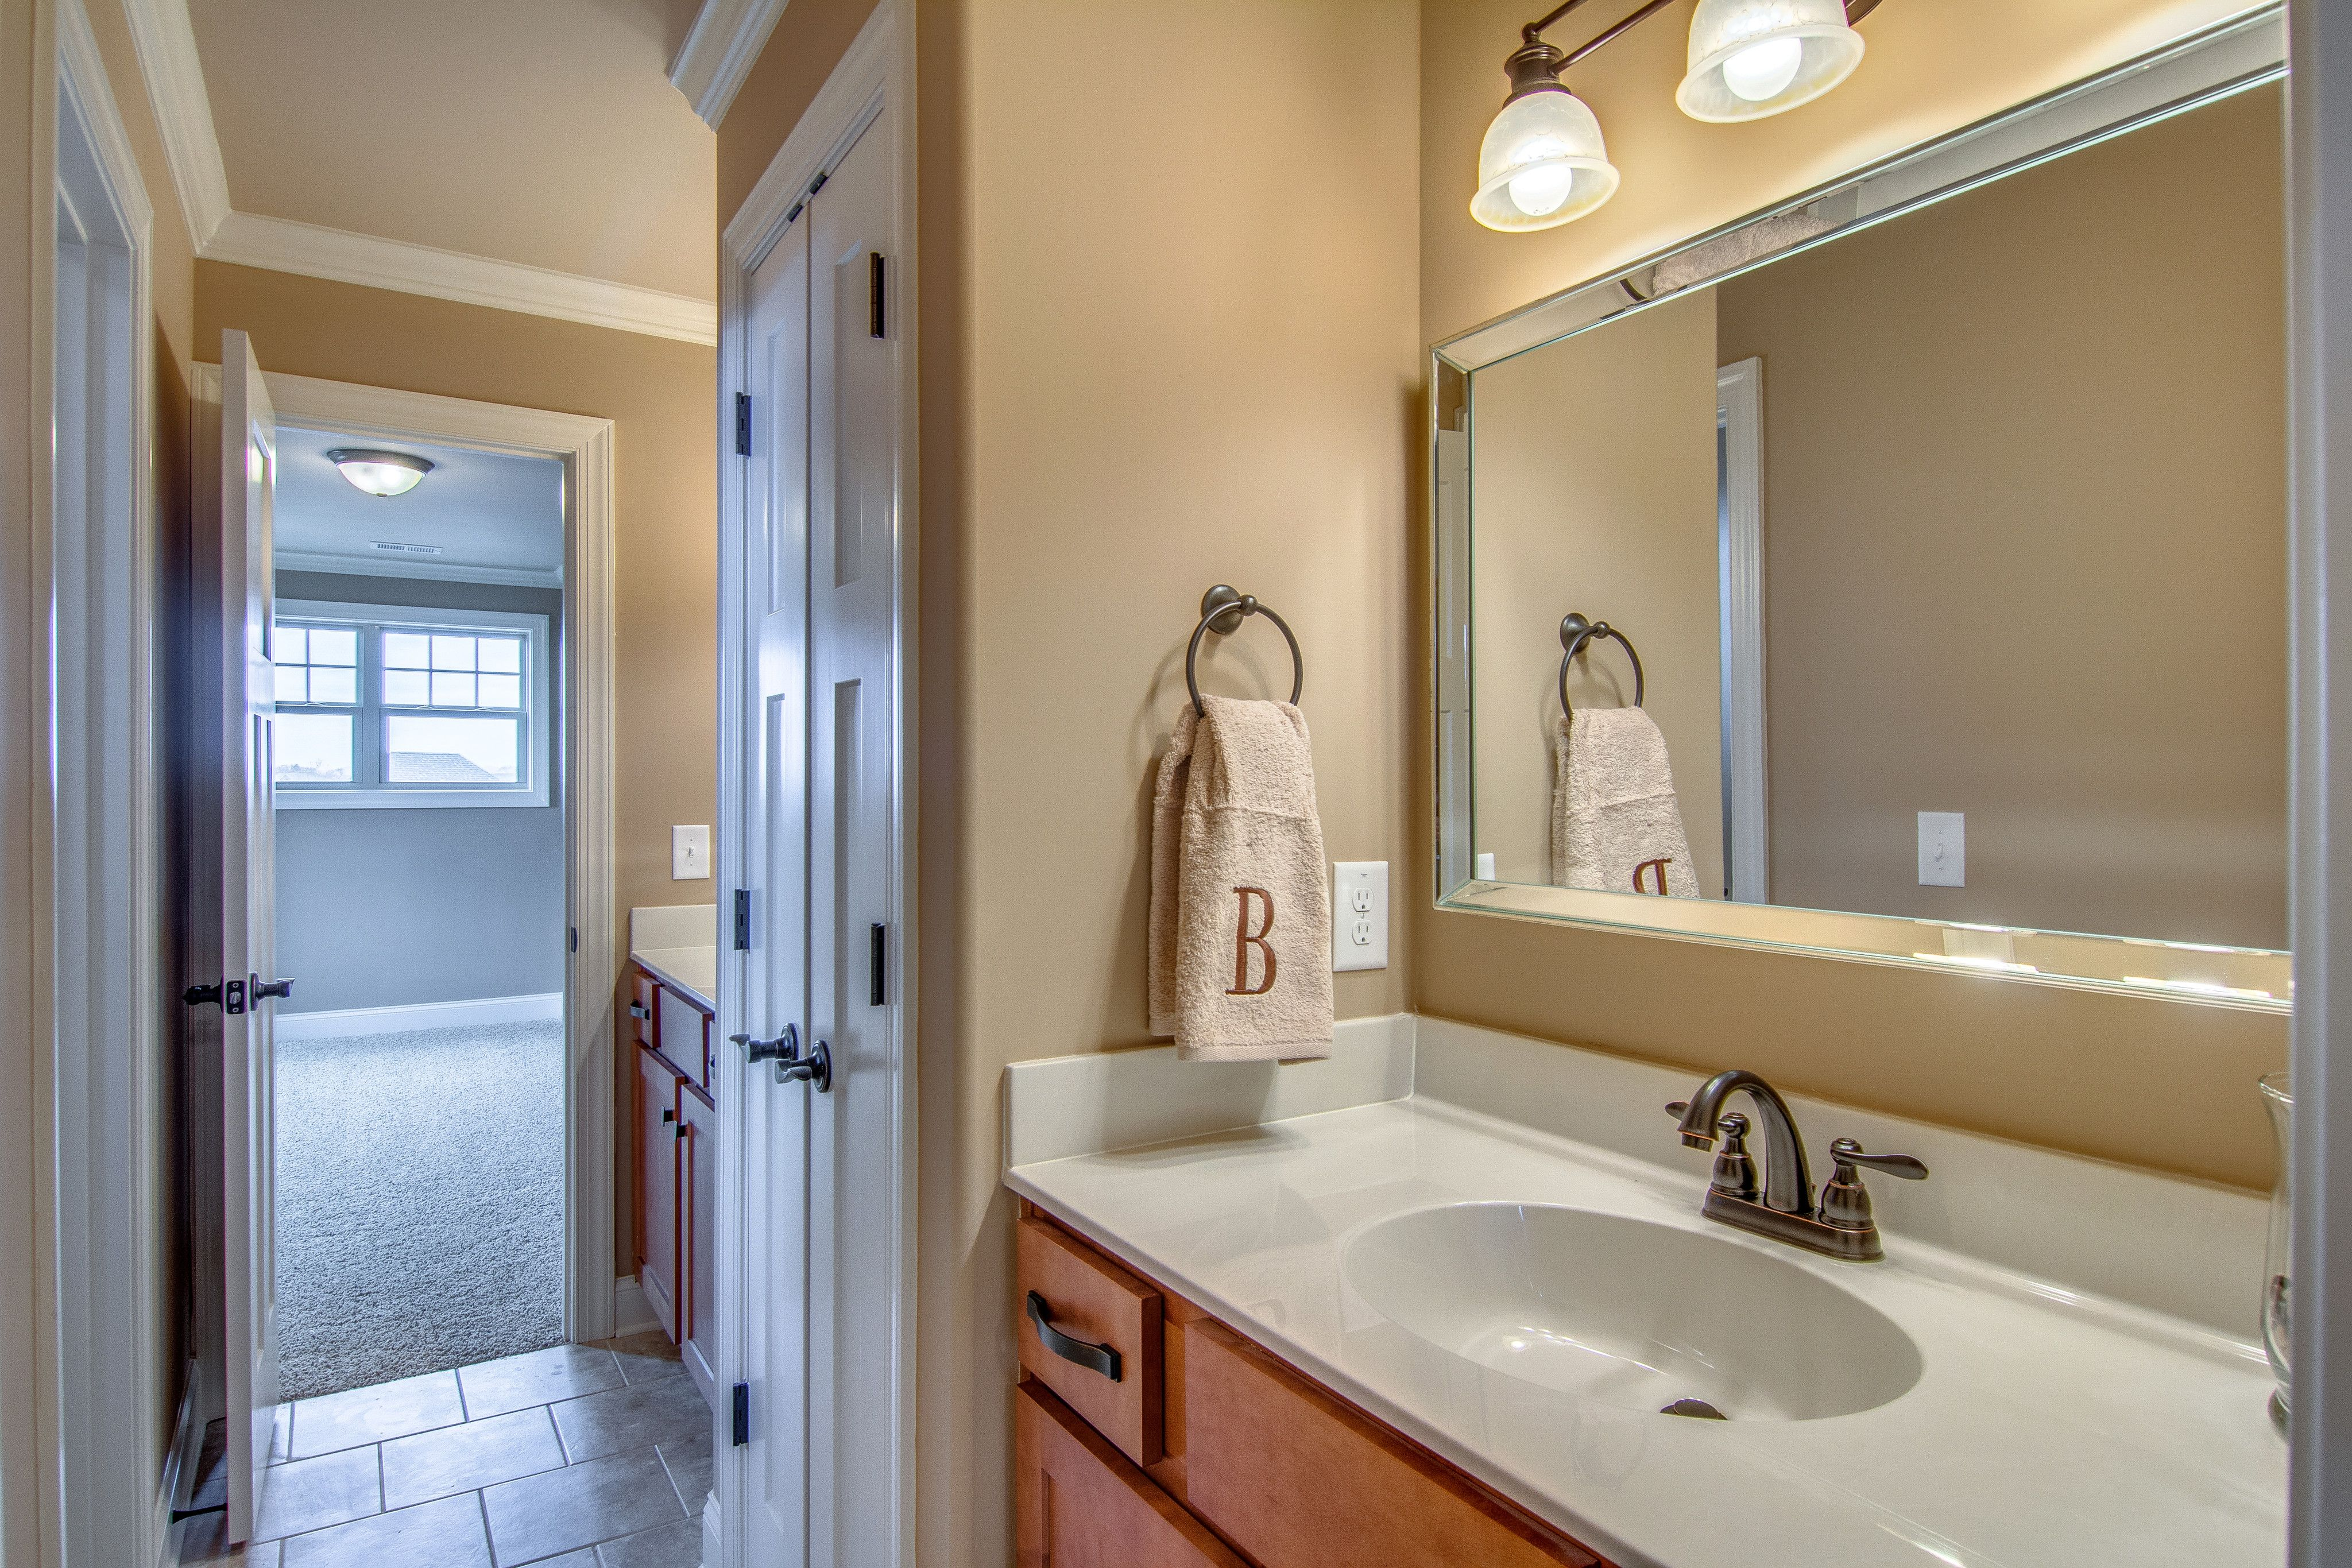 Jack jill bathroom in between bedroom 1 2 upstairs w for Jack and jill closet design